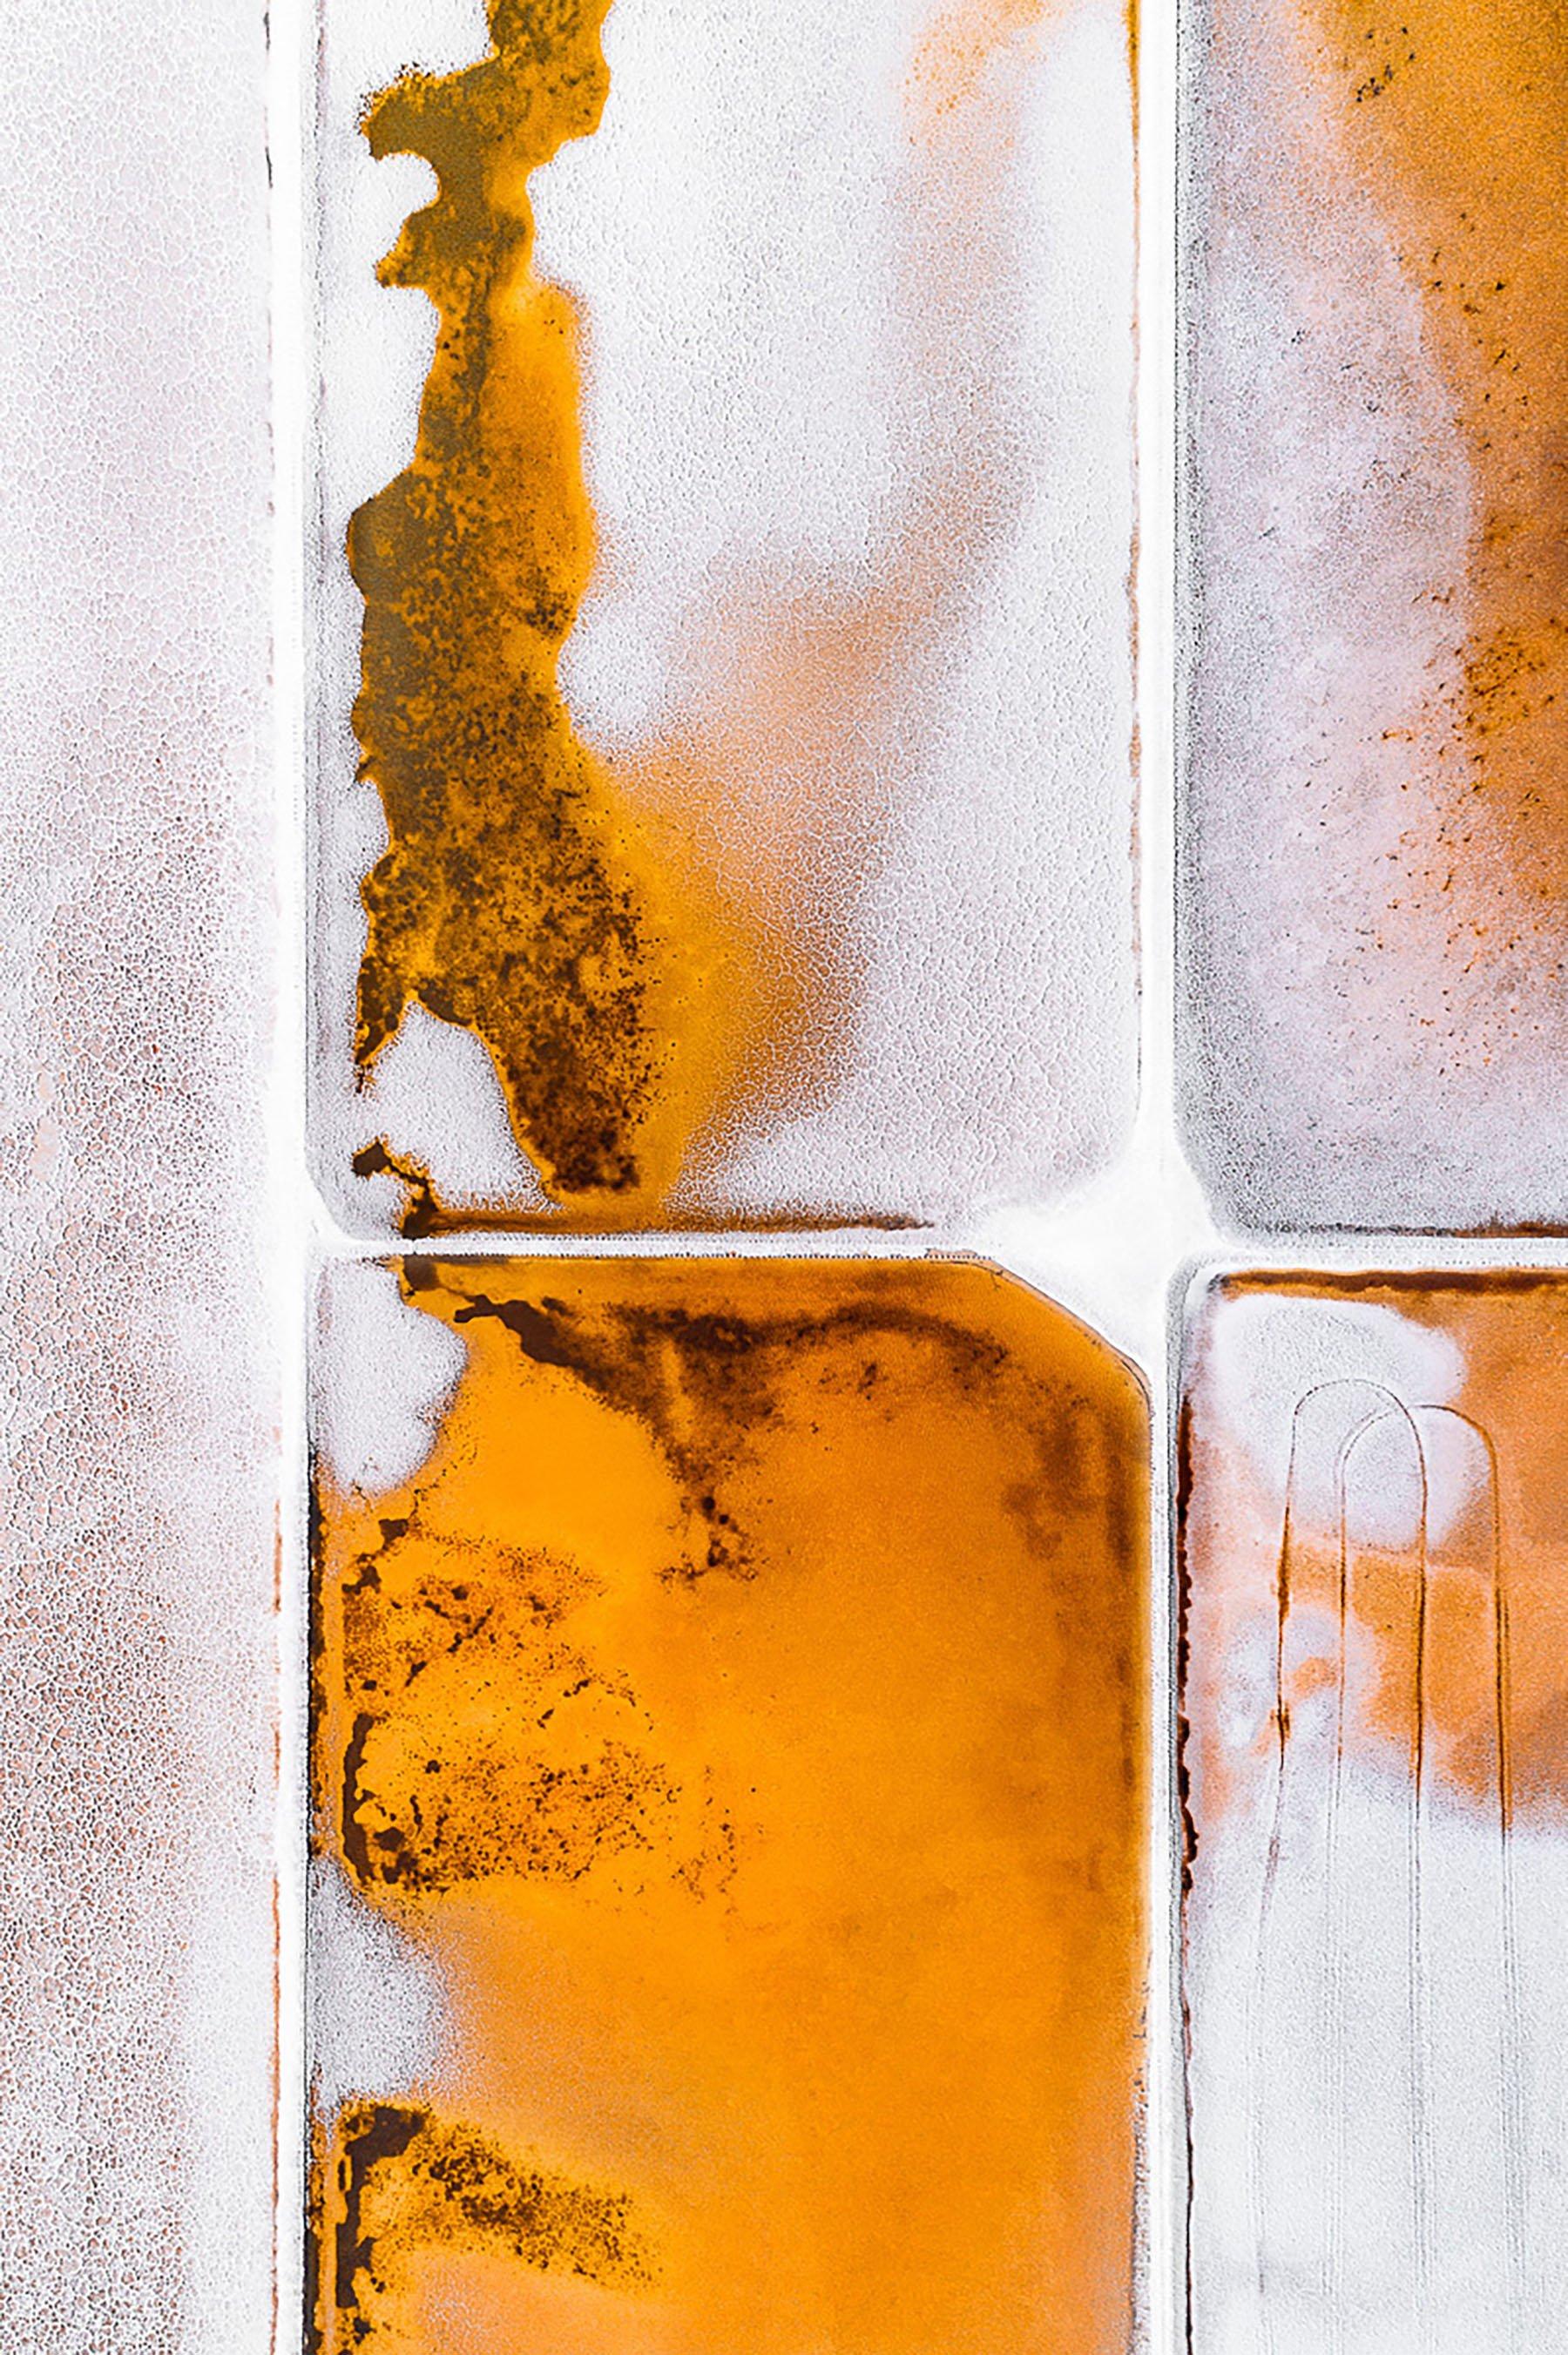 iGNANT-Photography-Tom-Hegen-The-Salt-Series-012